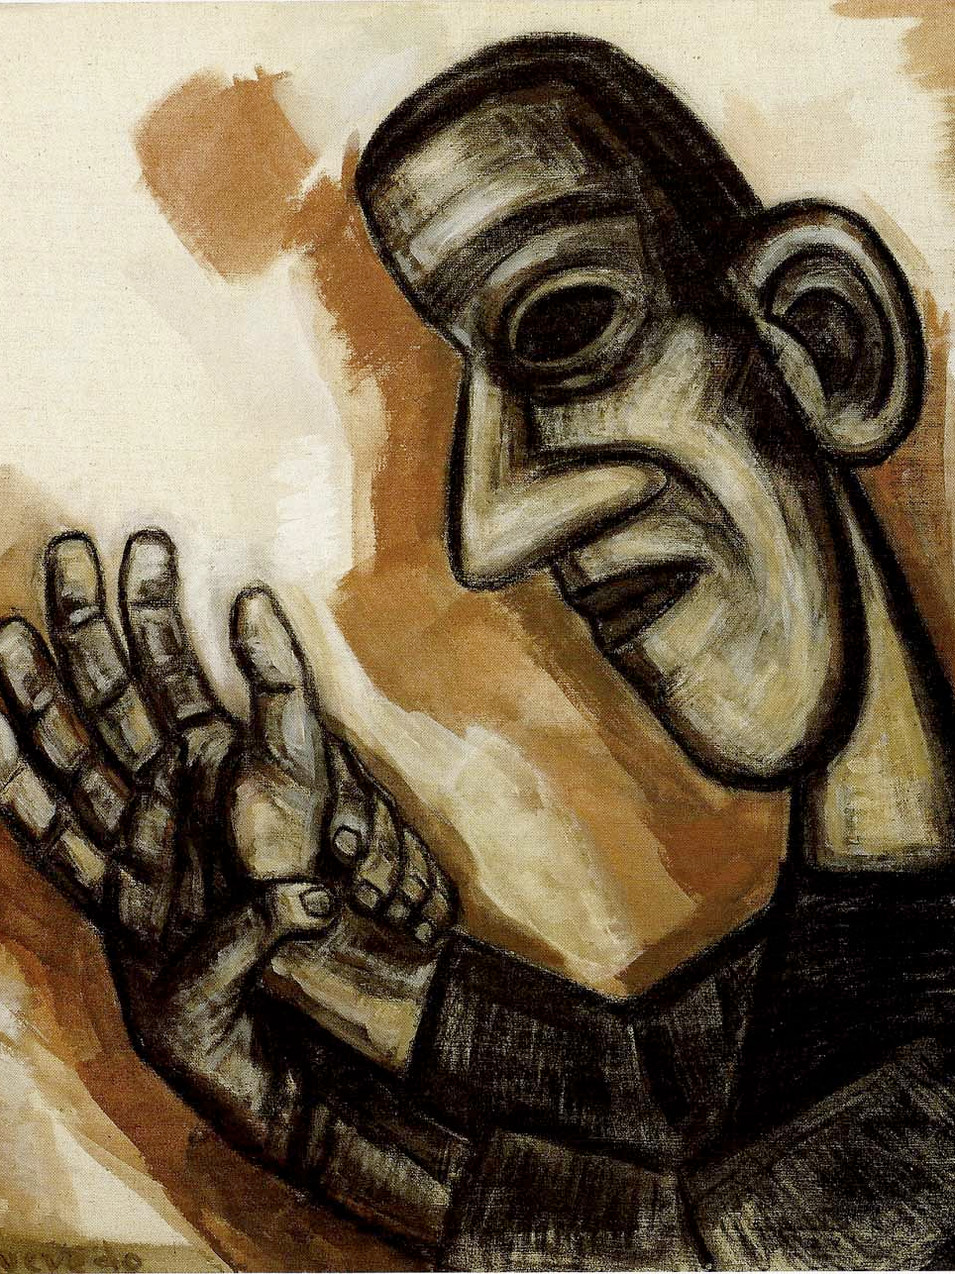 Nuria Quevedo | Kopf-Hand | 1992 | Kohle, Tempera auf Leinwand | 116 x 100 cm